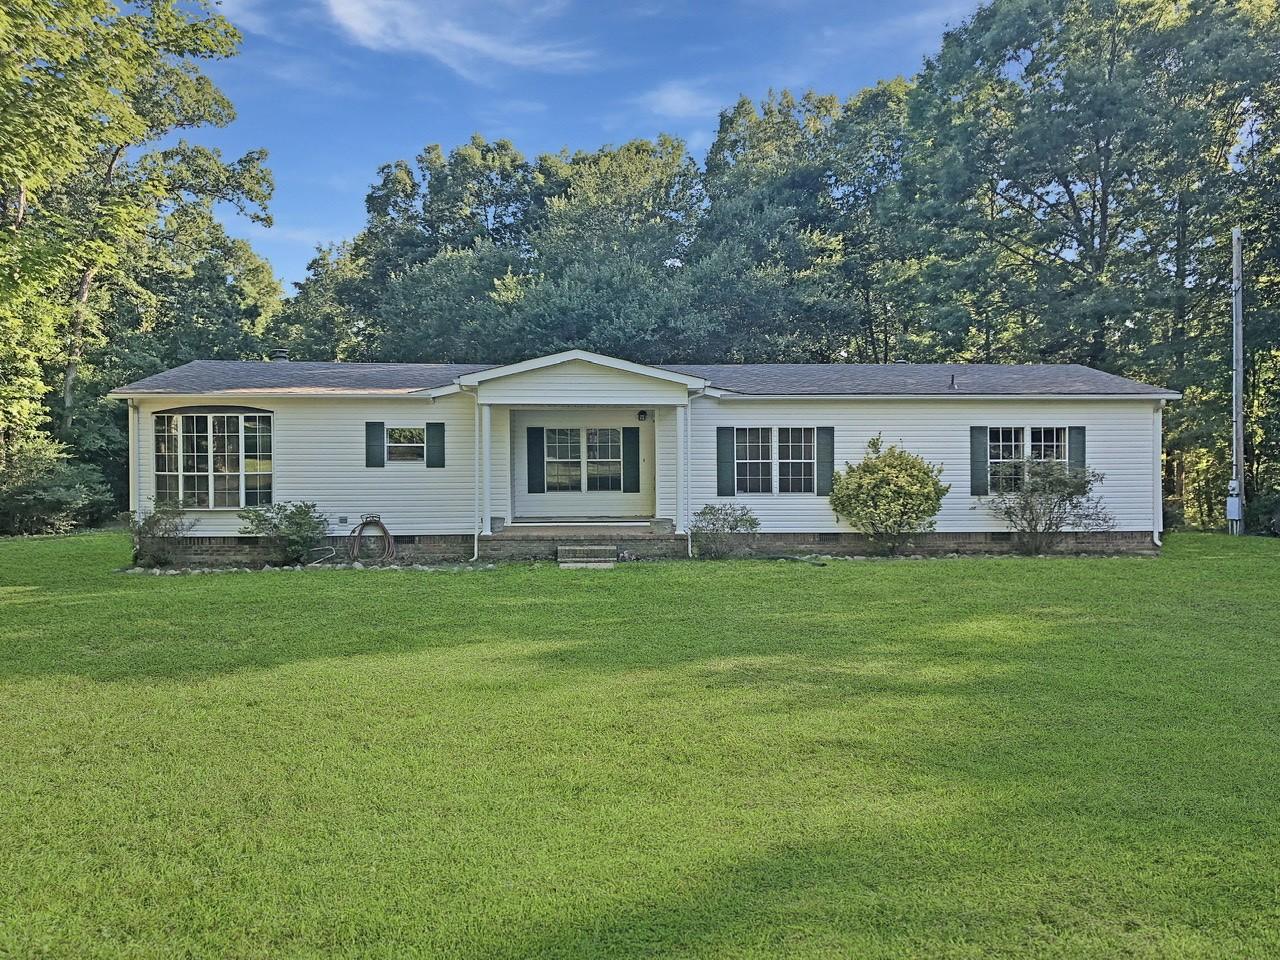 218 Watson Rd Property Photo - Big Rock, TN real estate listing